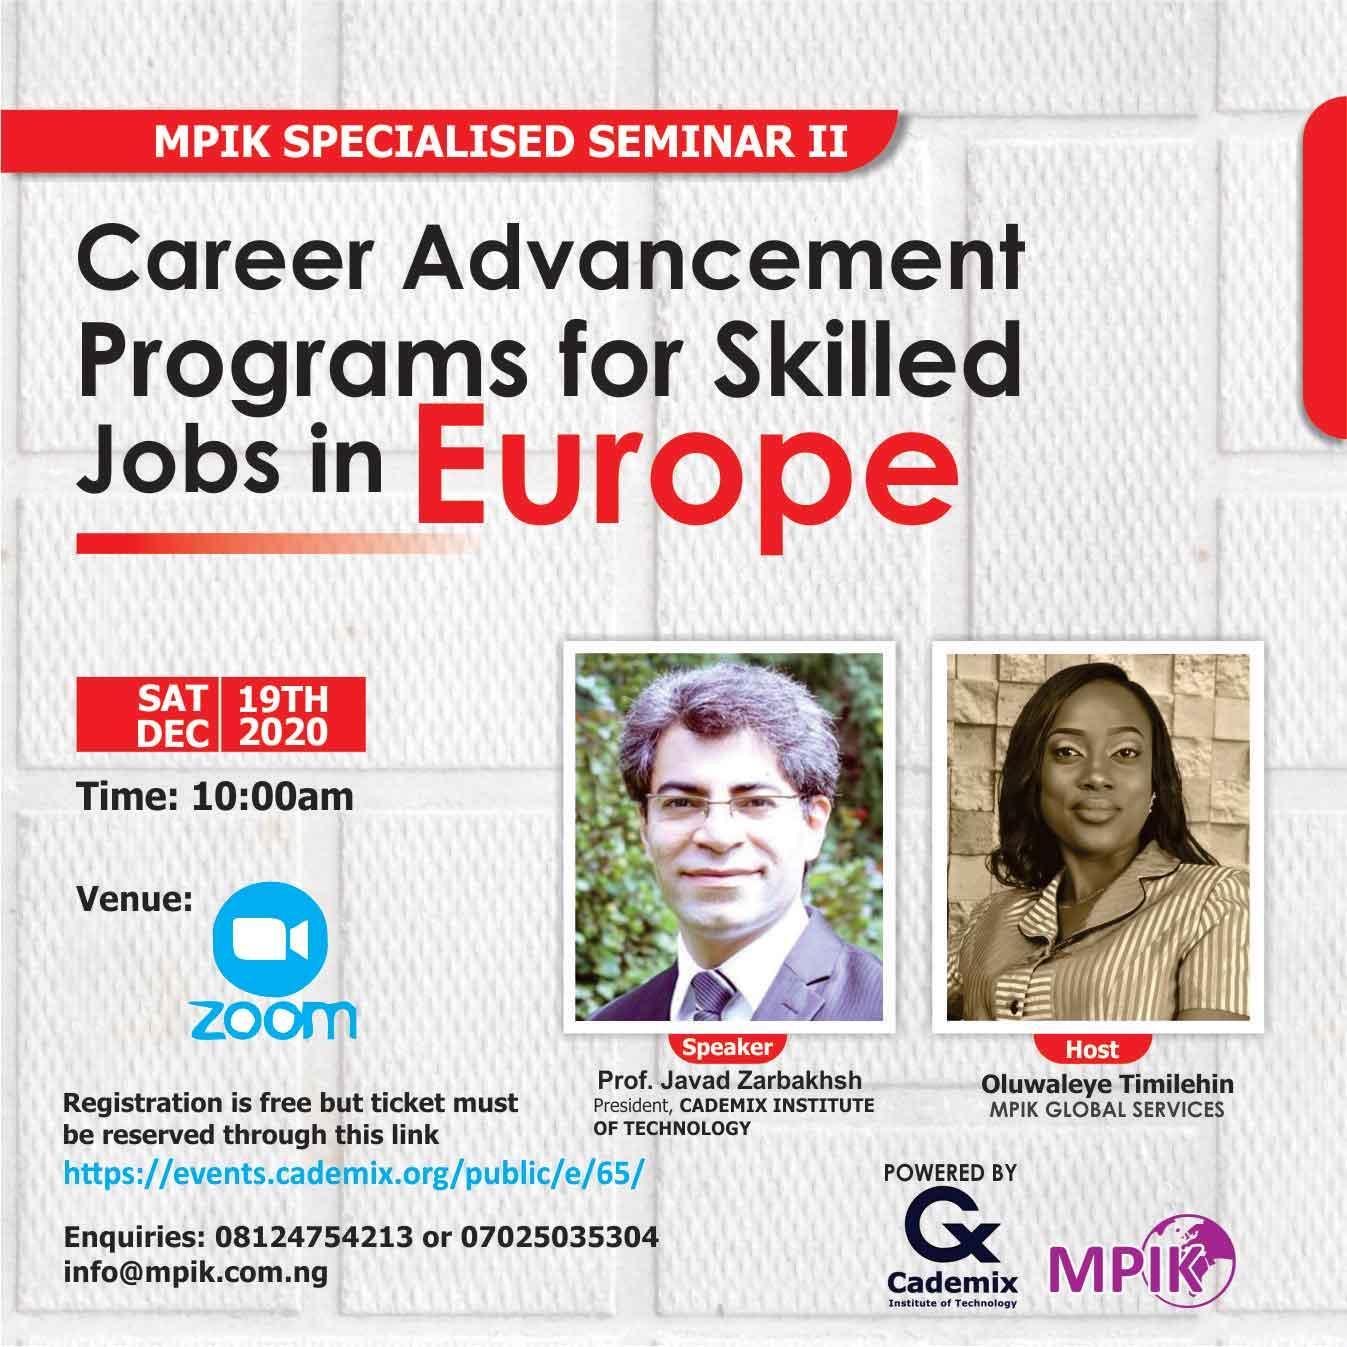 MPIK Cademix Seminar Nigeria Javad Zarbakhsh Zoom Oluwaleye Timilehin Africa Nigeria Ibadan Career Advancement Programs skilled Jobs Europe